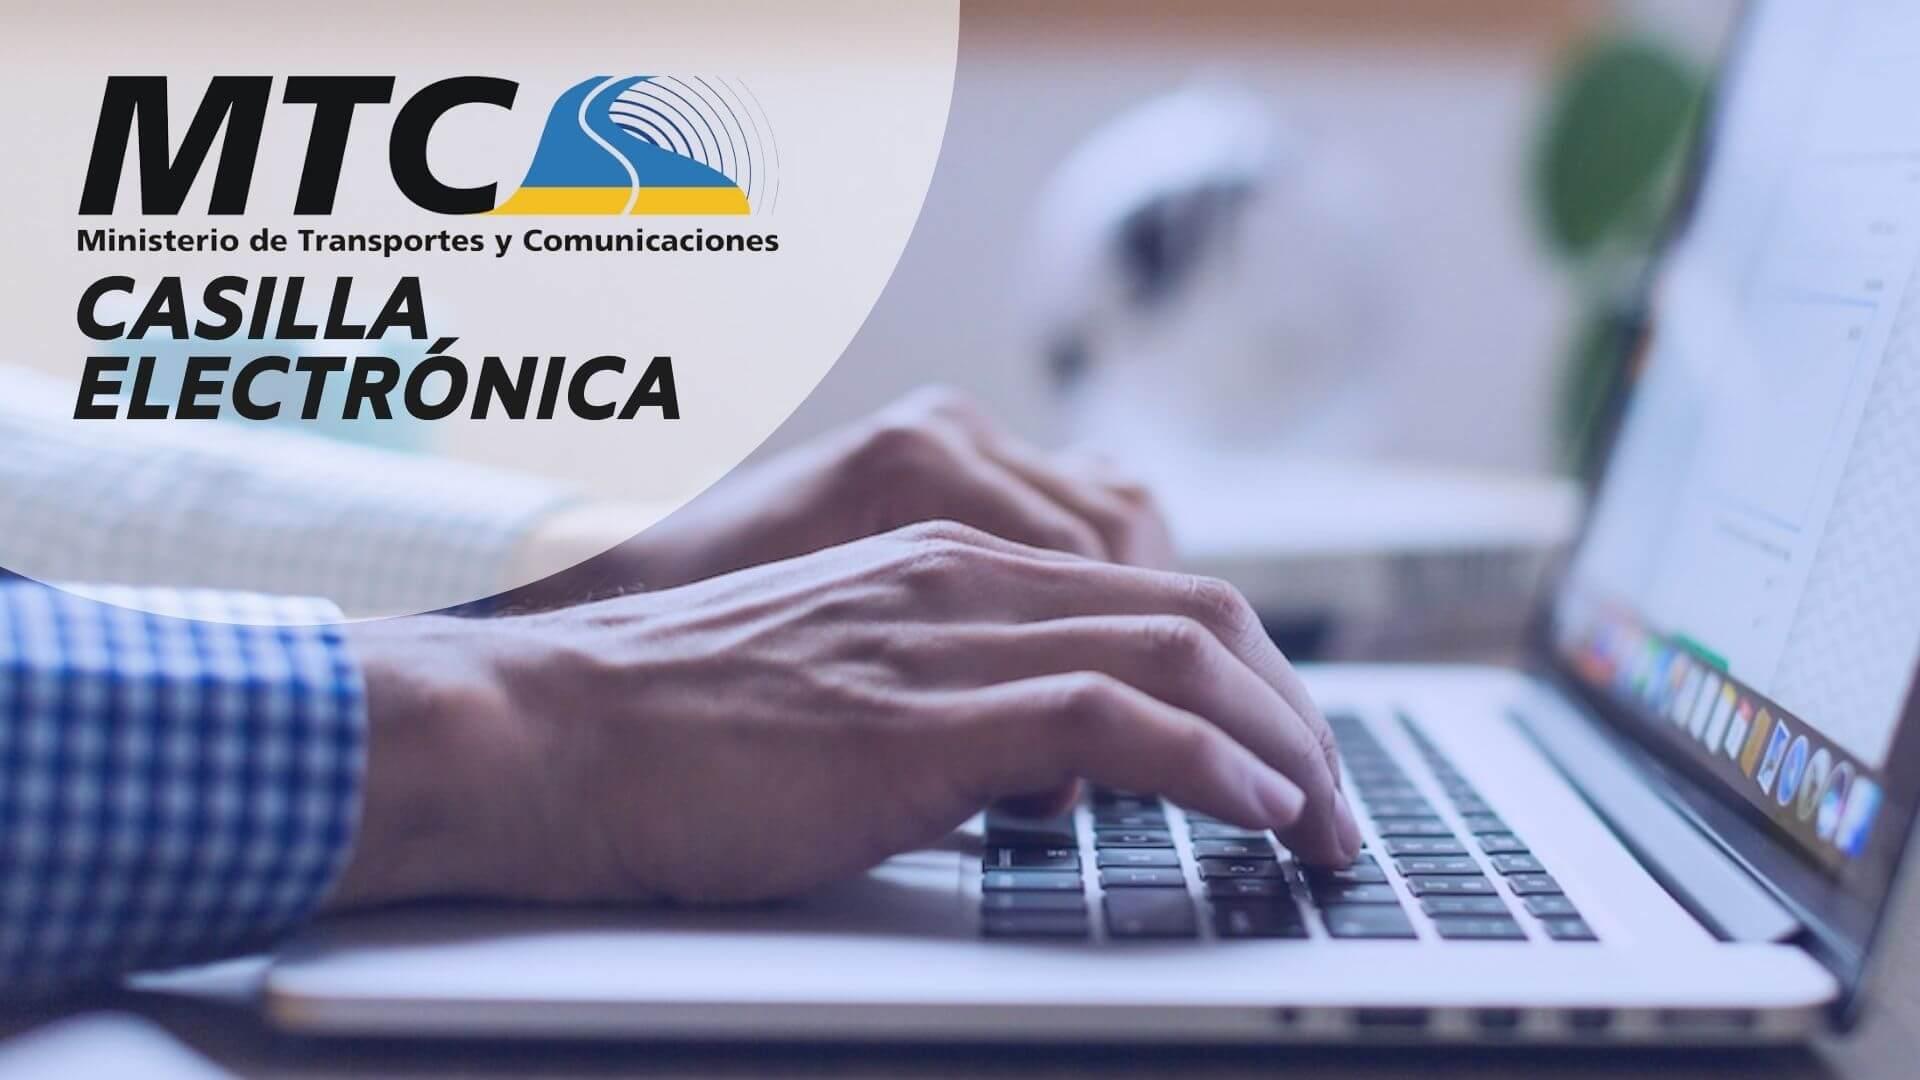 casilla-electronica-mtc